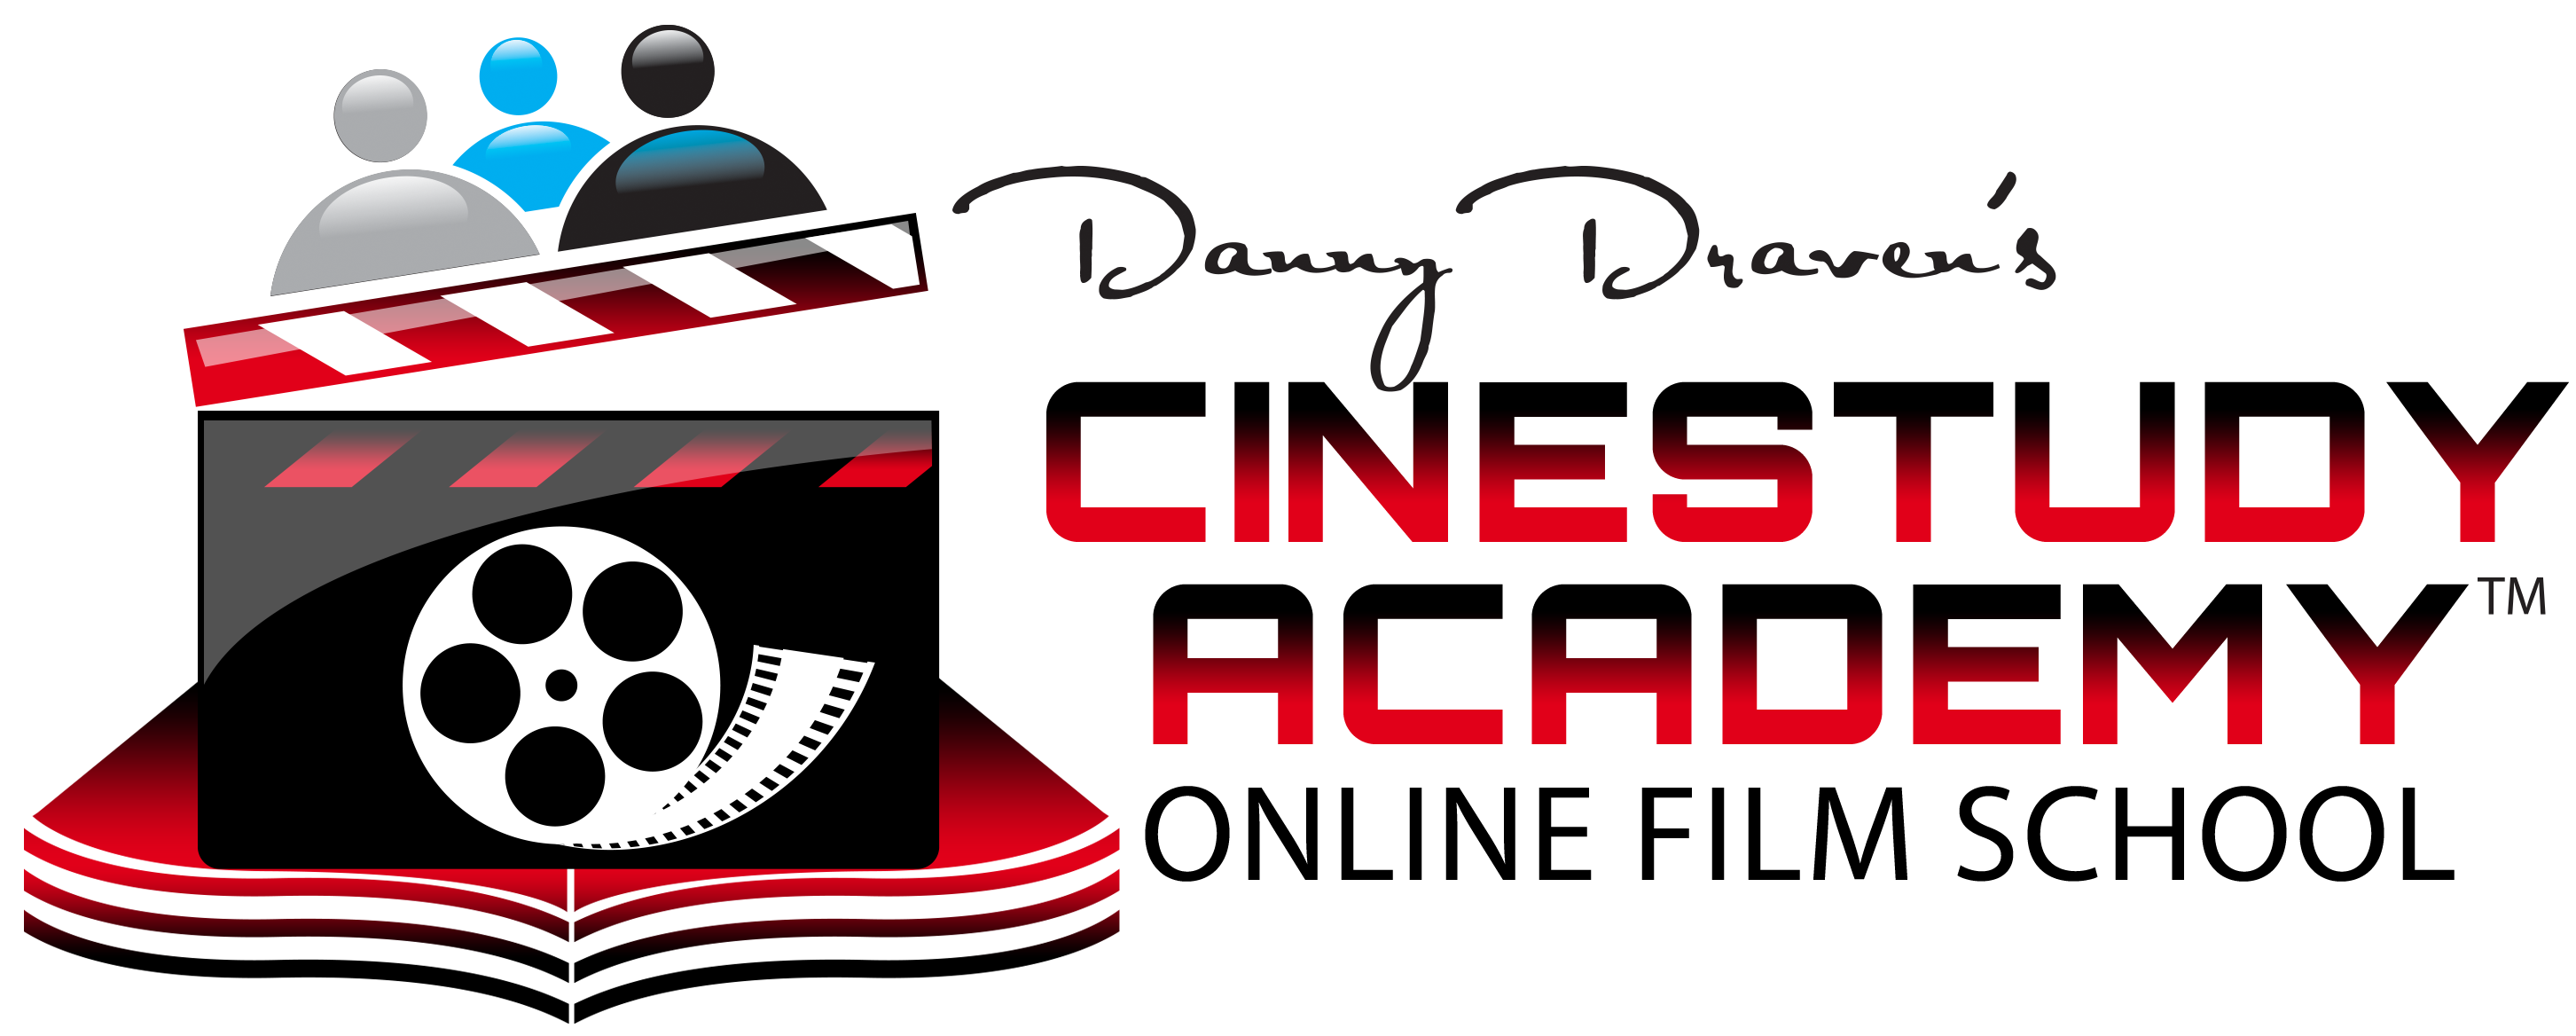 Danny Draven's CINESTUDY ACADEMY